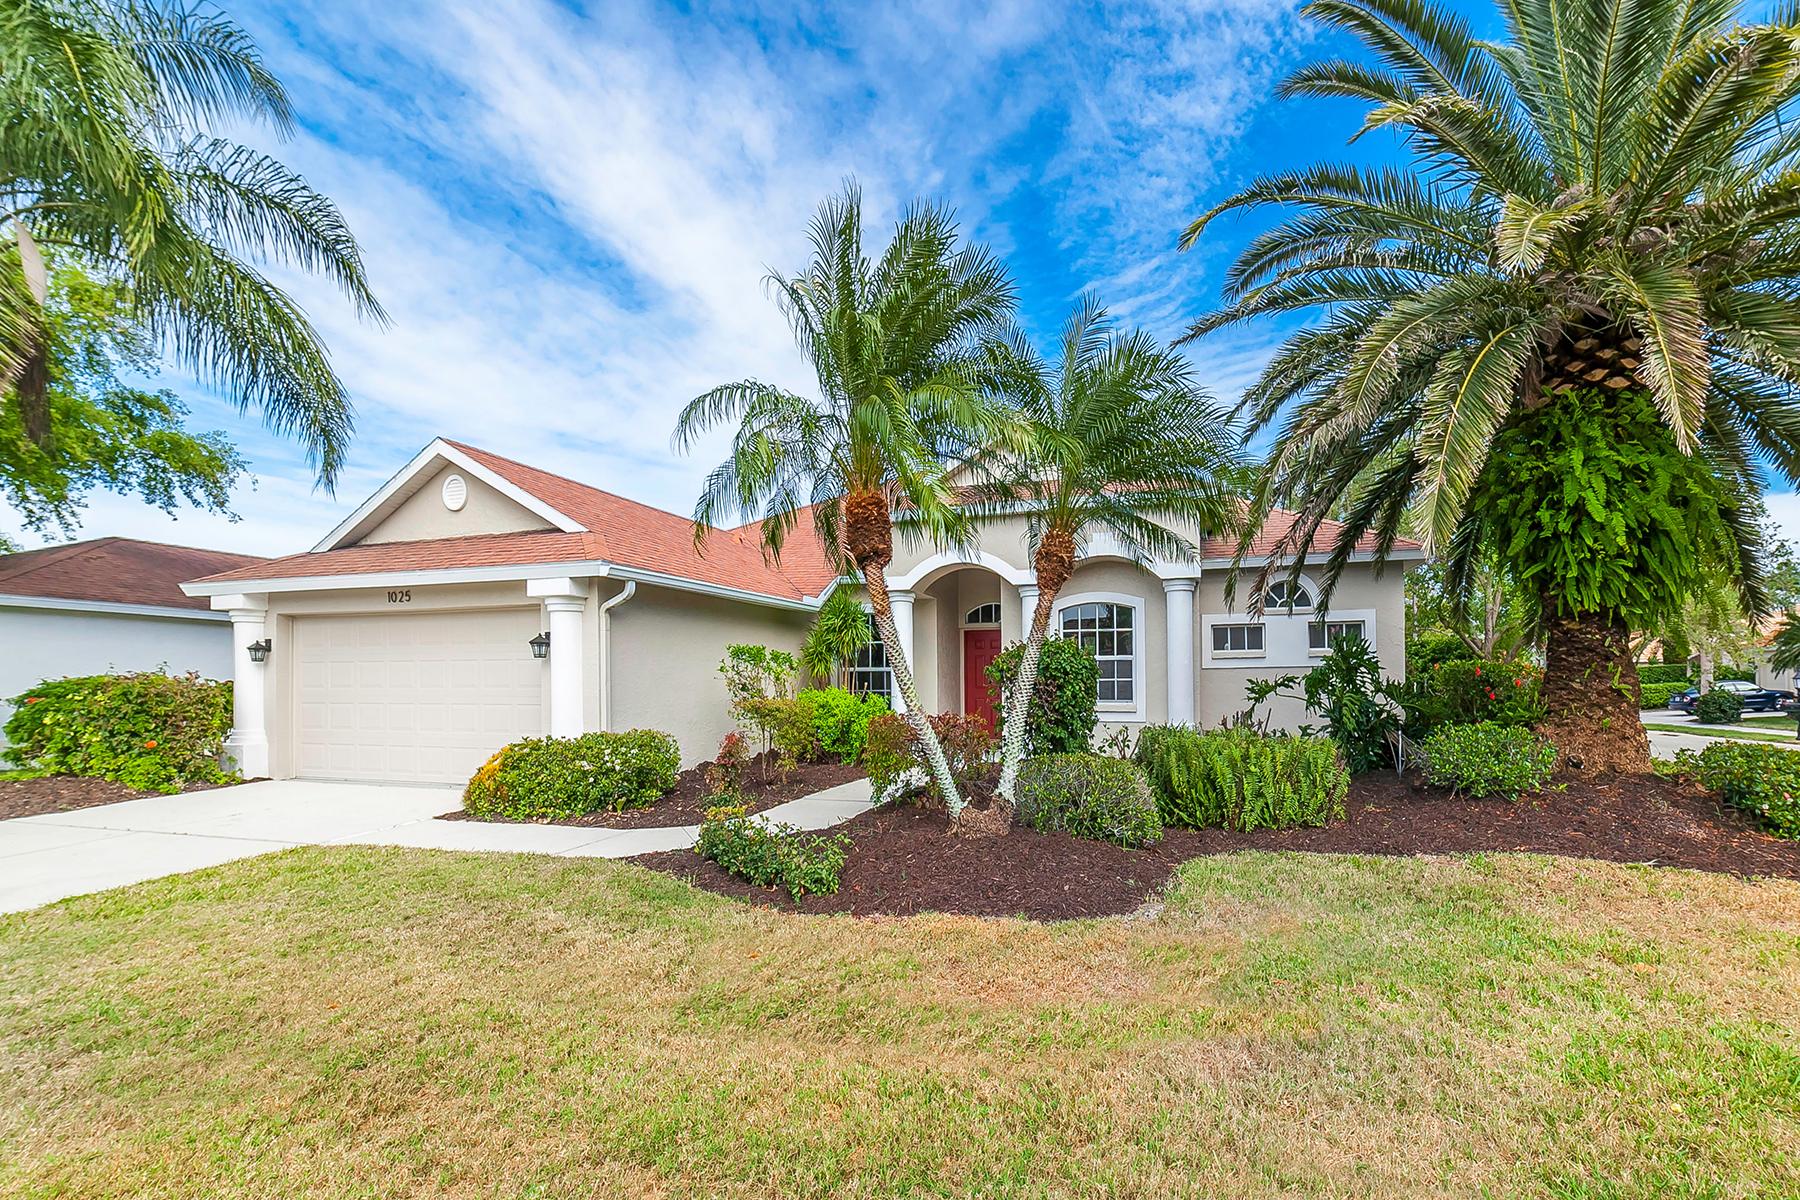 Single Family Home for Sale at WOODLANDS IN RIVENDELL 1025 Oak Preserve Ln, Osprey, Florida, 34229 United States